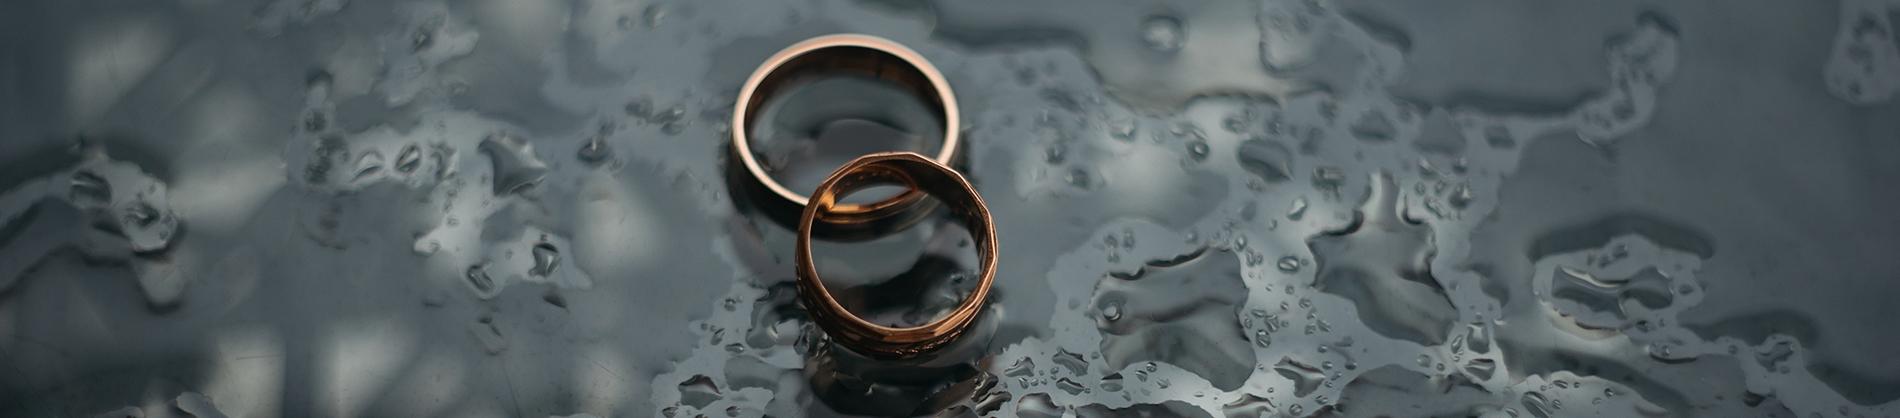 Wedding rings on a rainy floor